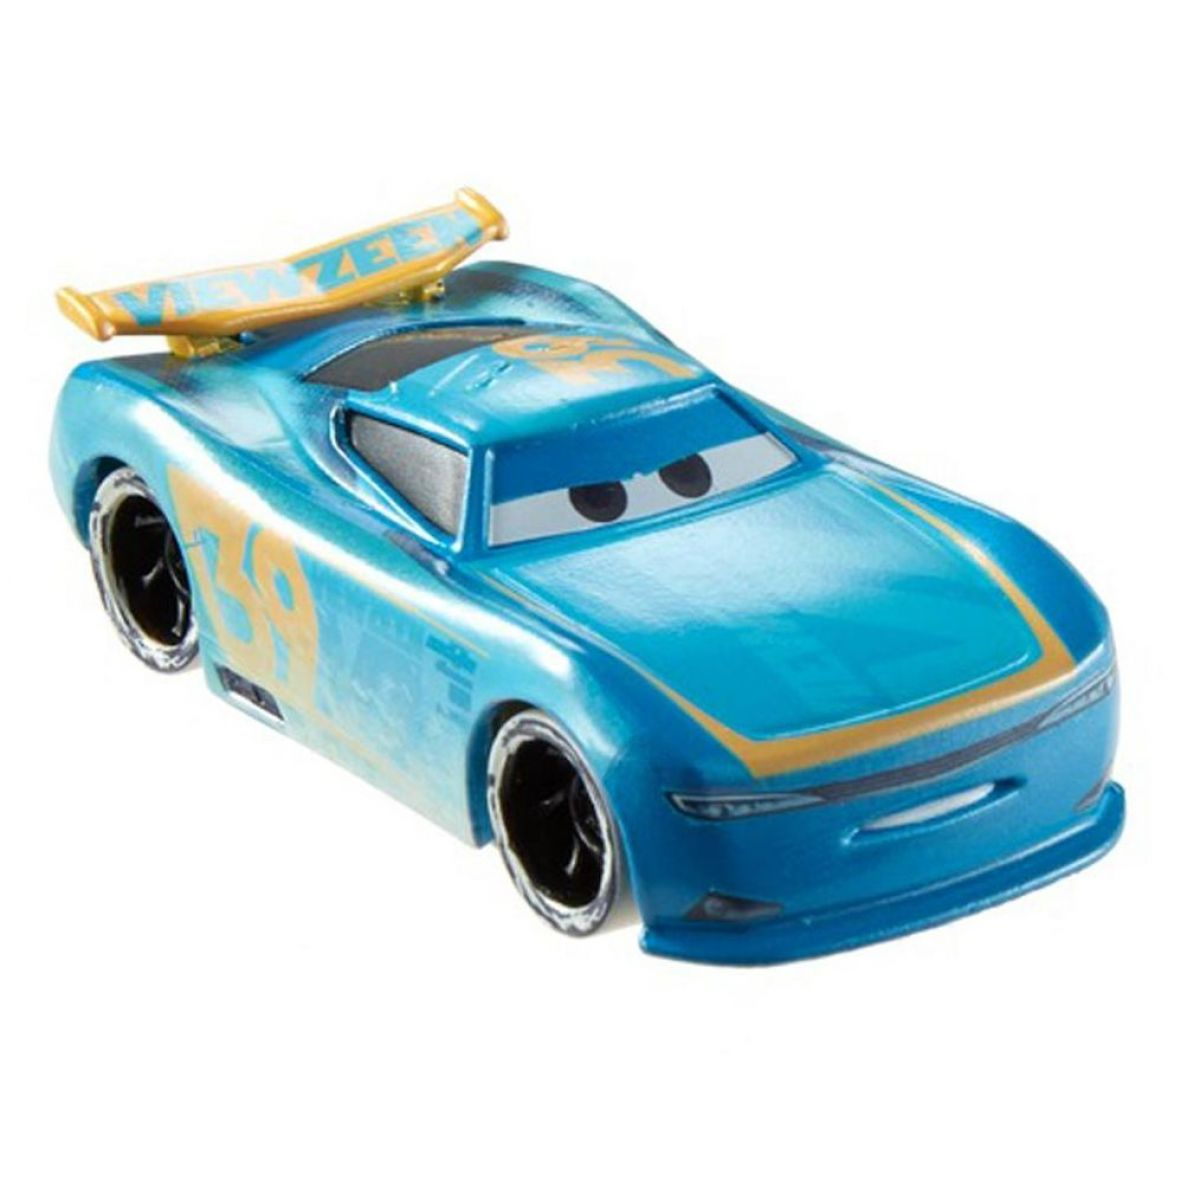 Mattel Cars 3 auta Plážová edice Michael Rotor